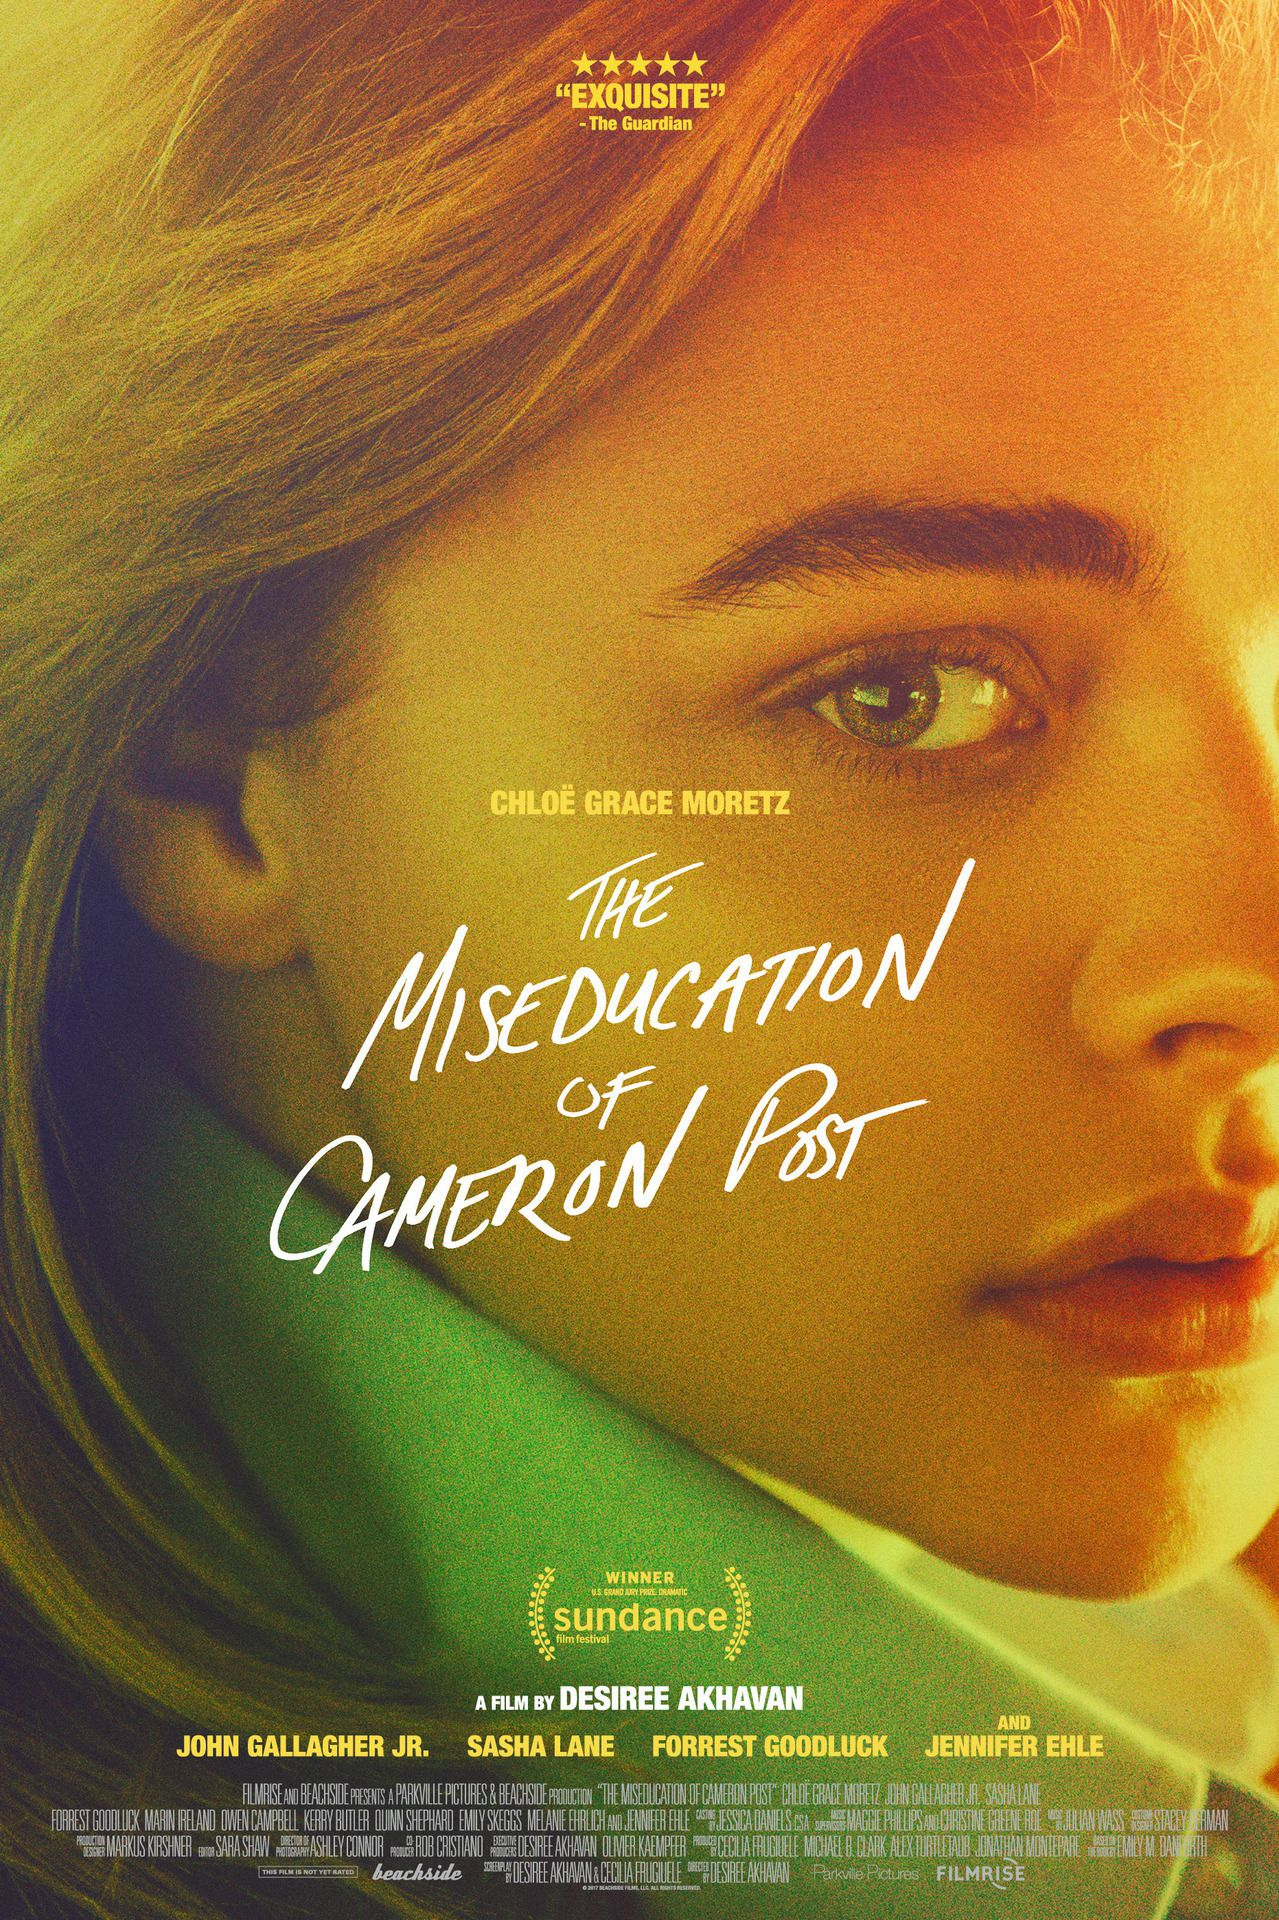 Miseducation of Cameron Post movie